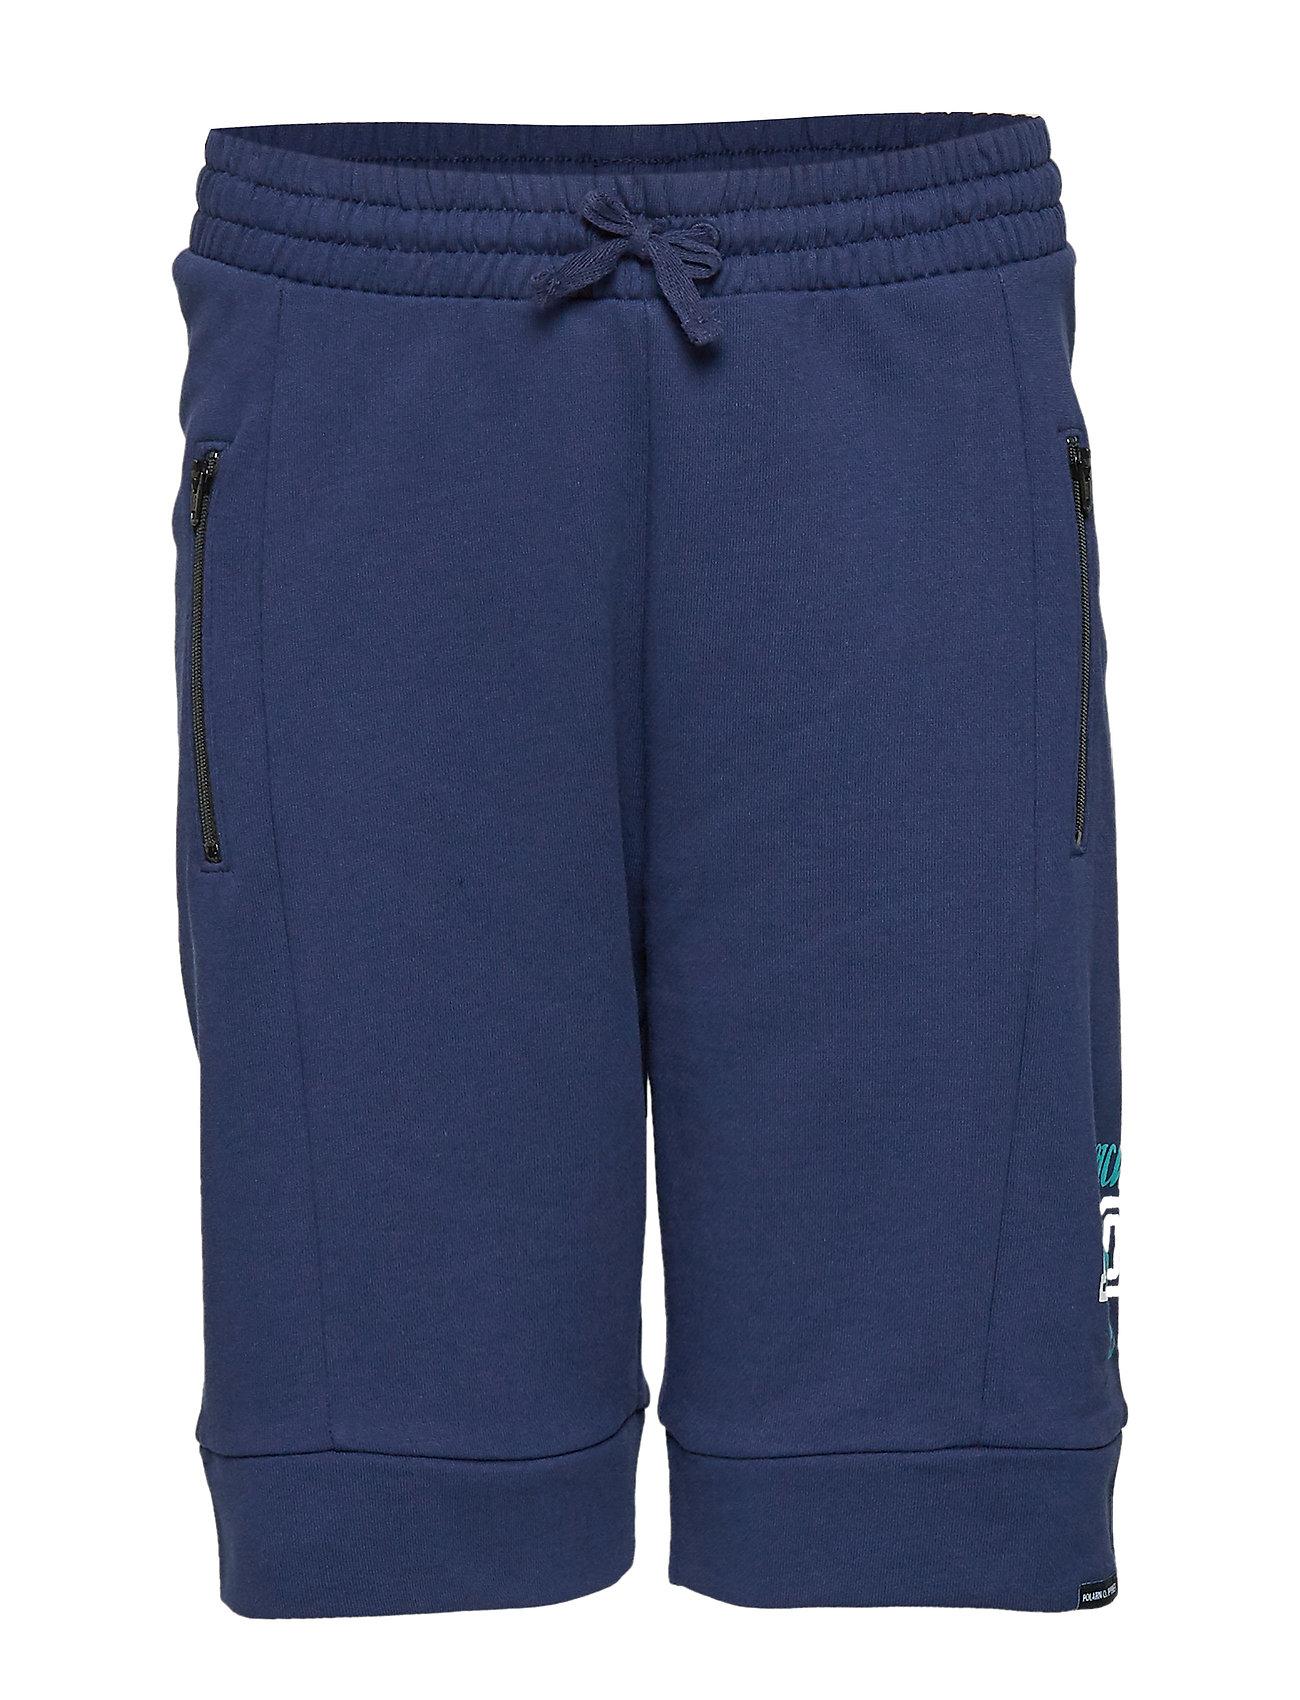 Polarn O. Pyret Shorts jersey School